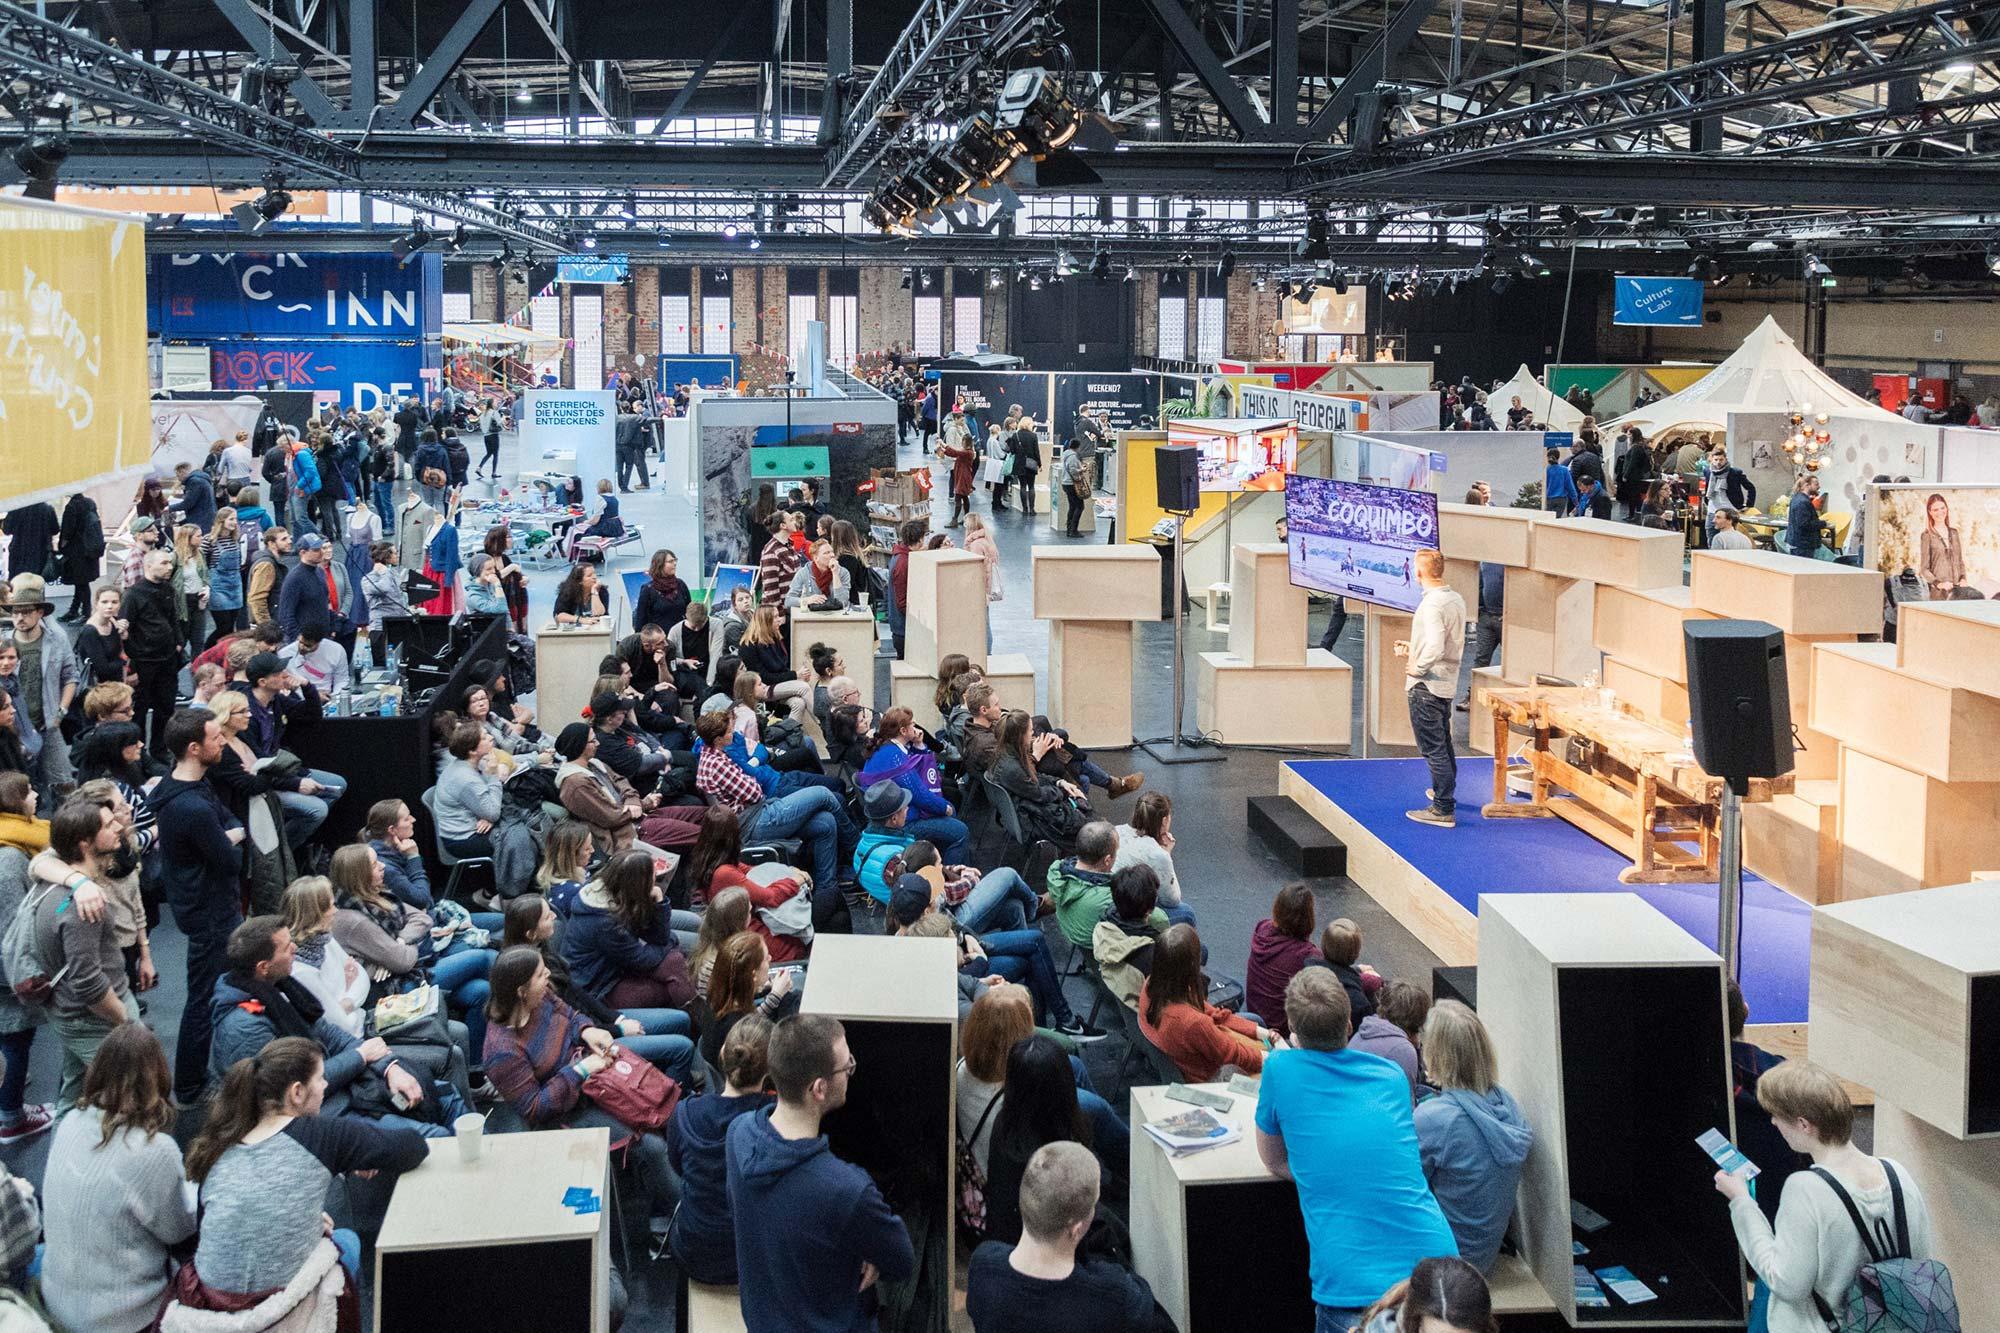 Vortrag auf dem Berlin Travel Festival 2019